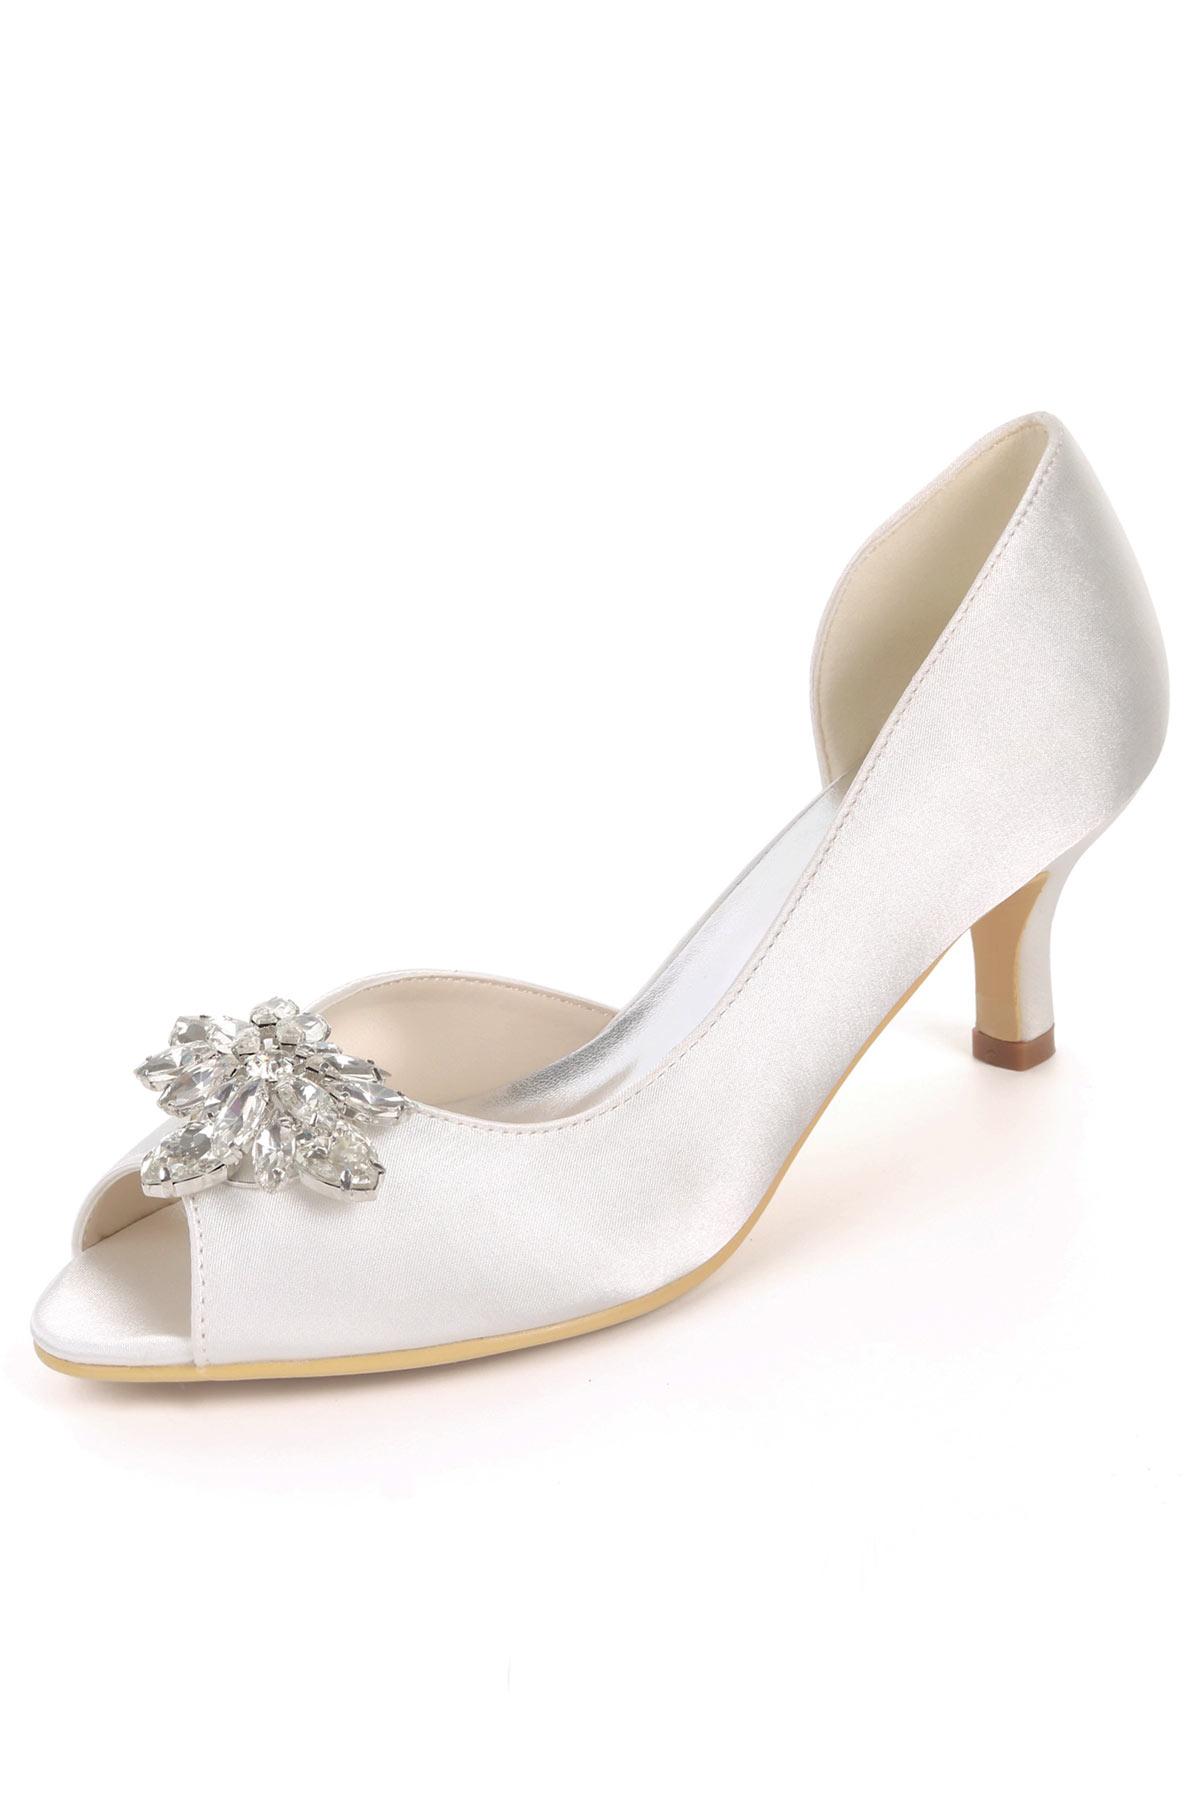 chaussure de mariage blanche à talon moyen embelli de strass et de perle